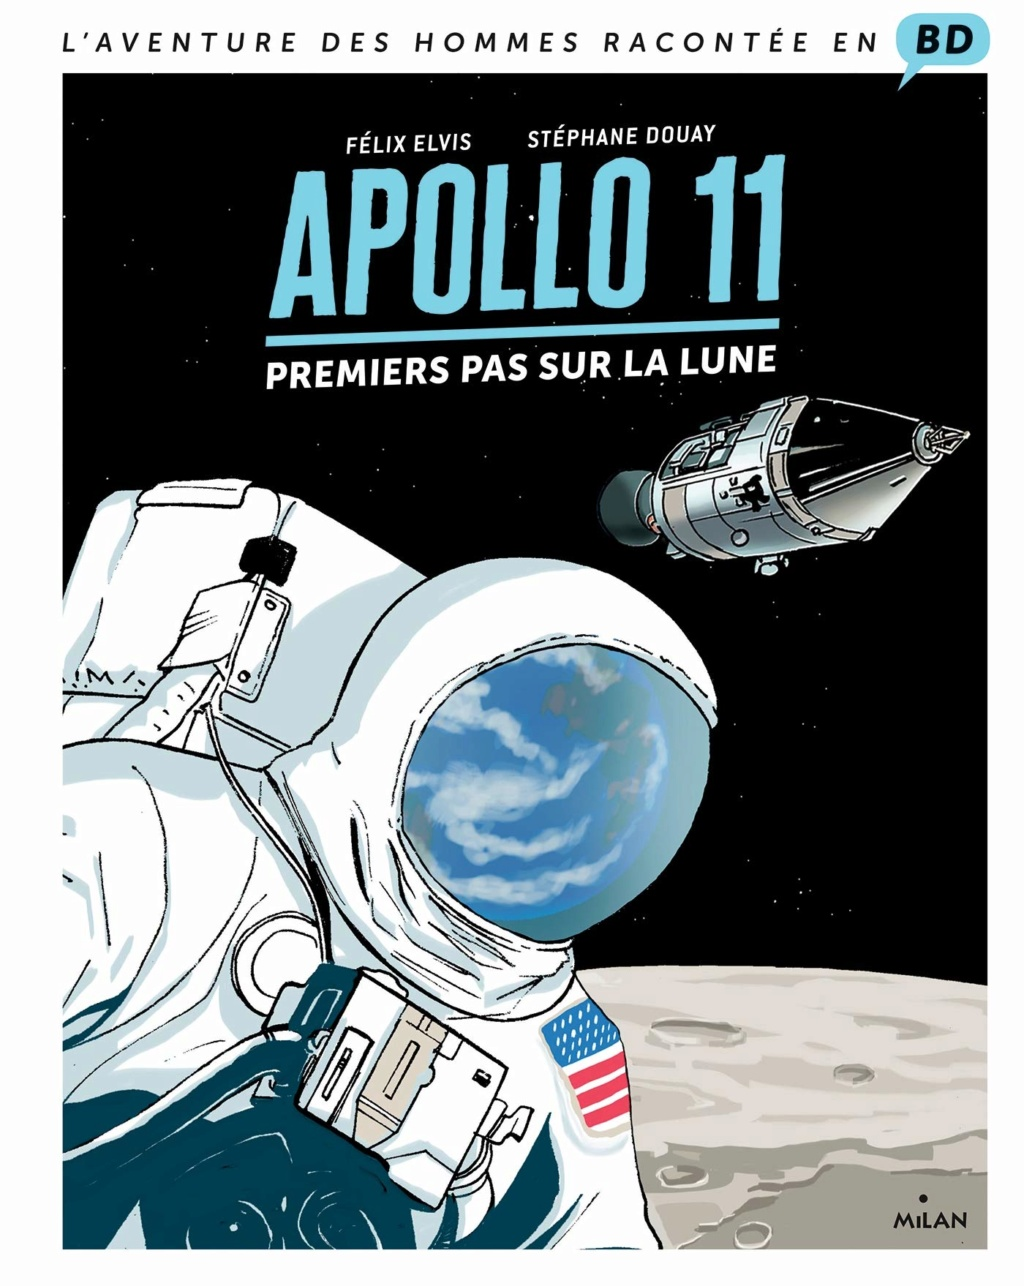 Apollo 11 (BD) sortie 27 fev 2019 71rh6l10